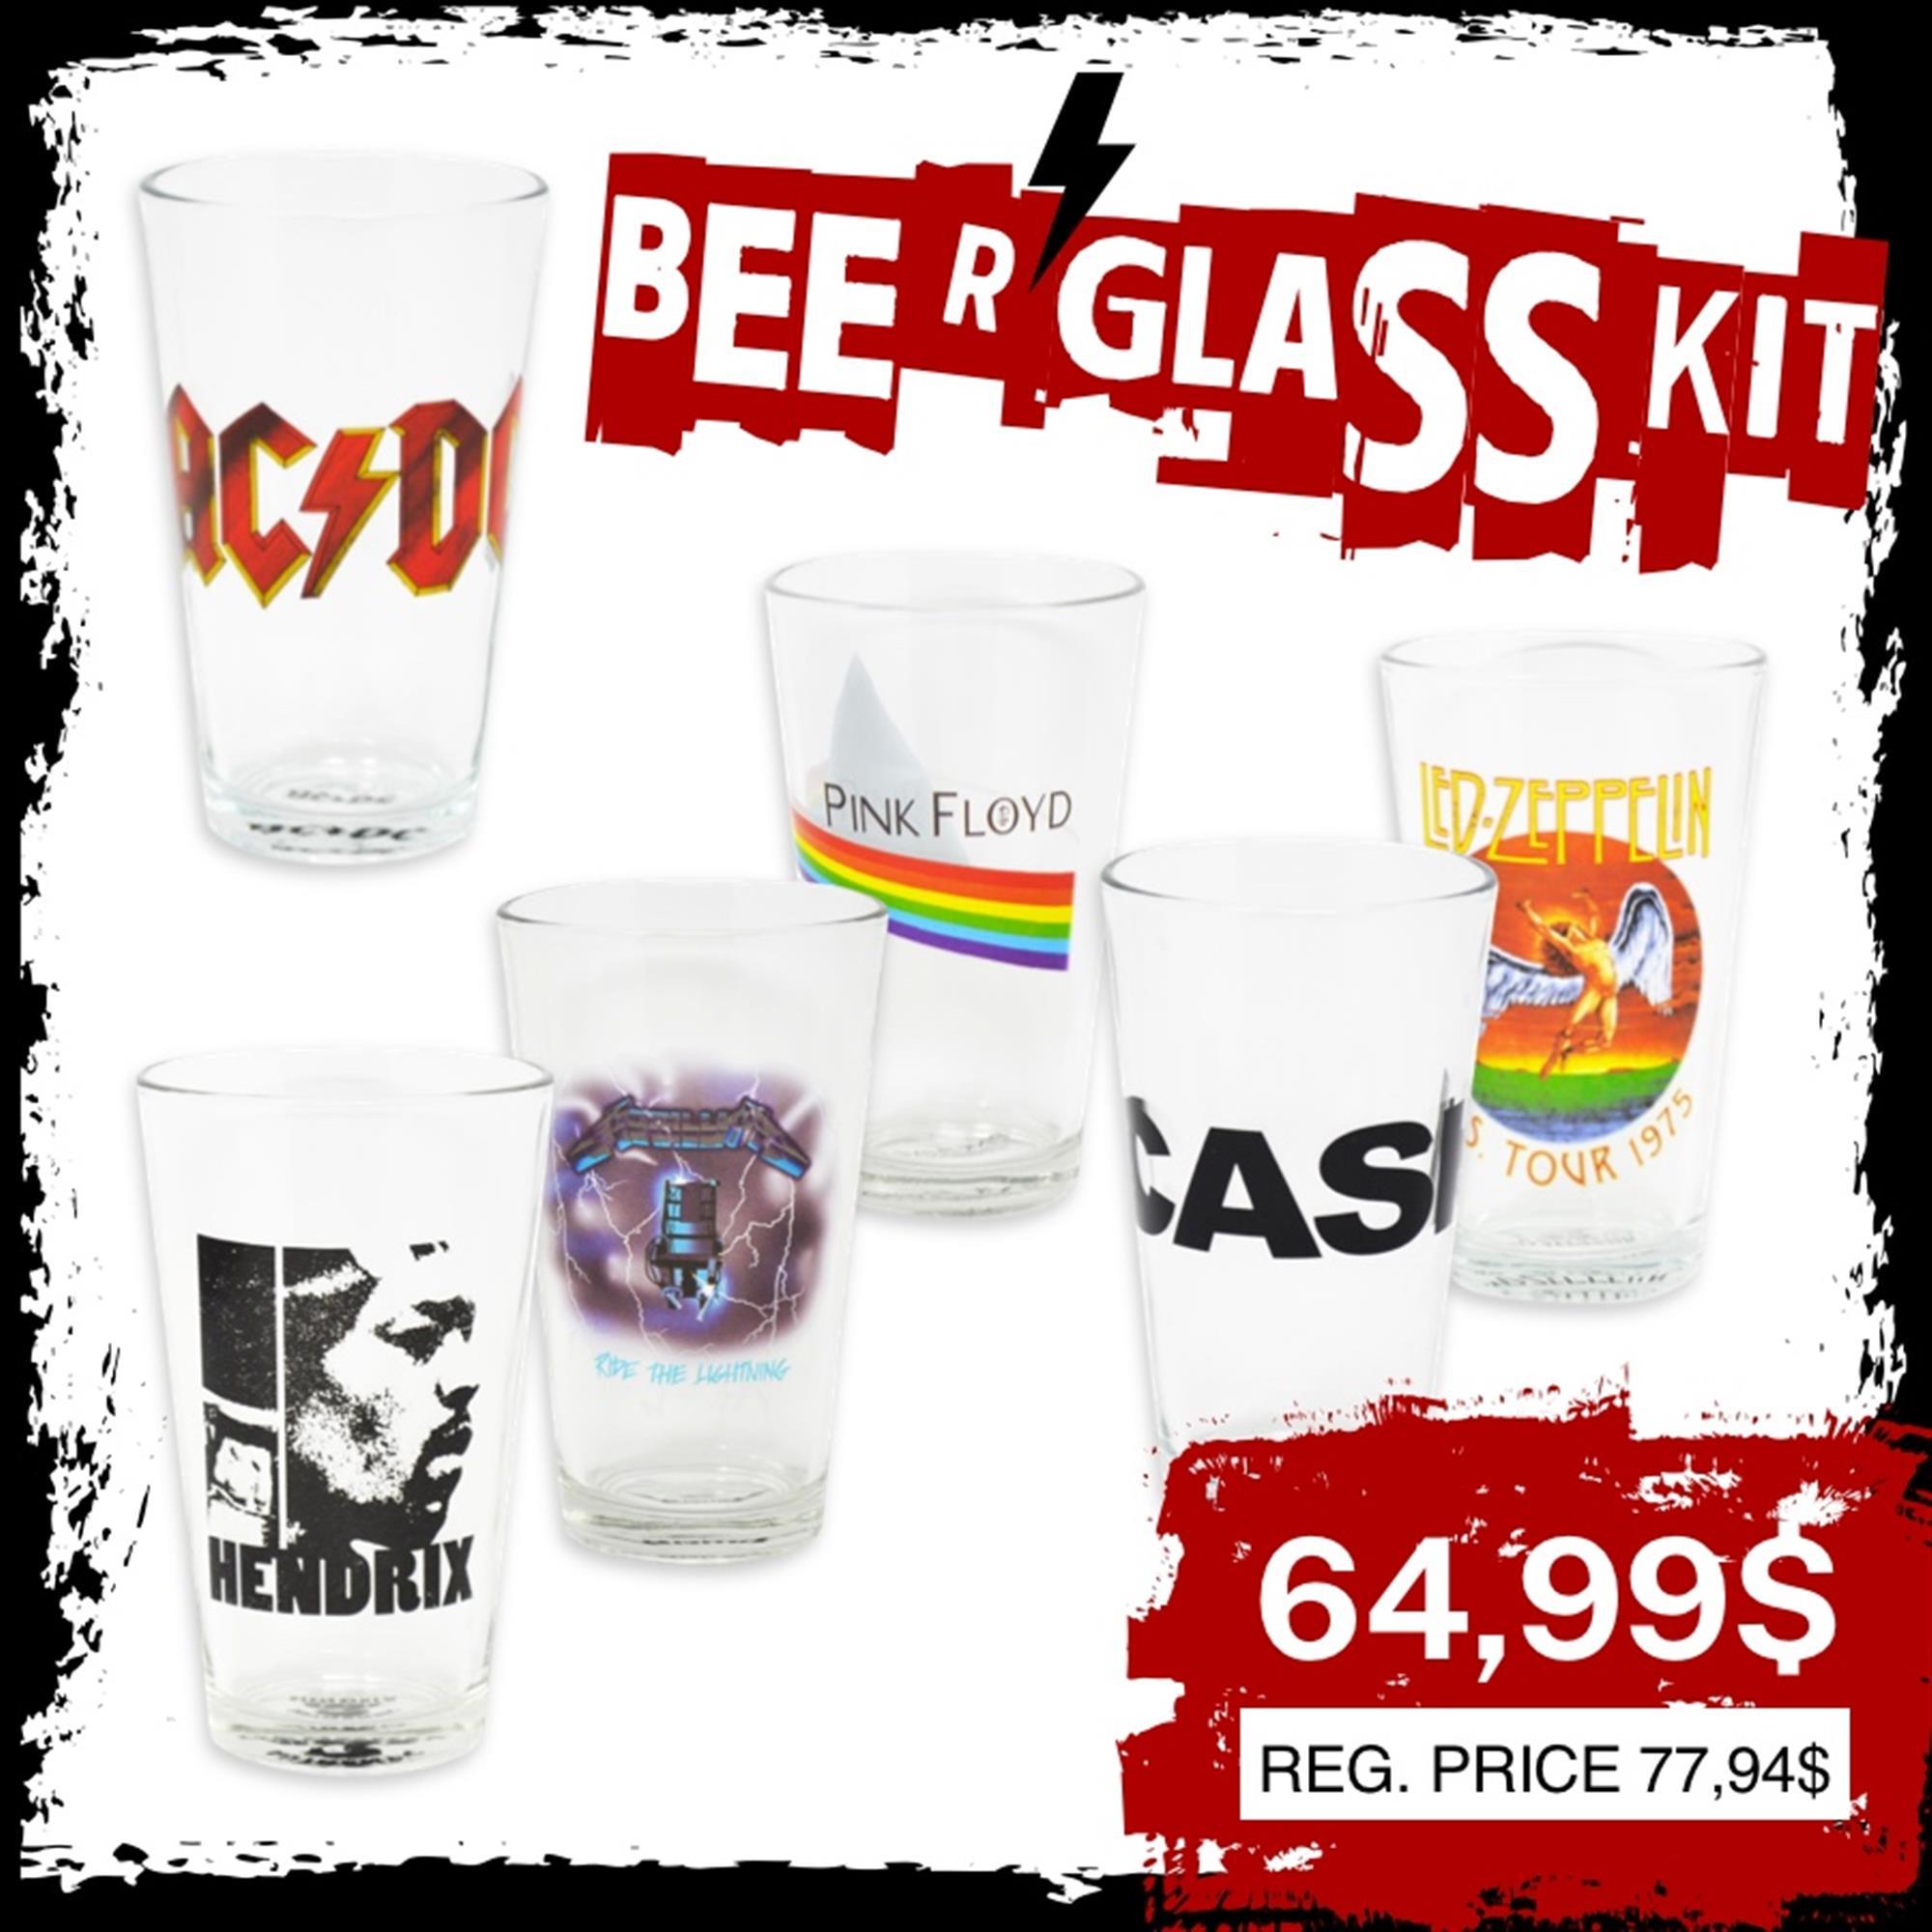 BEER GLASS KIT 1